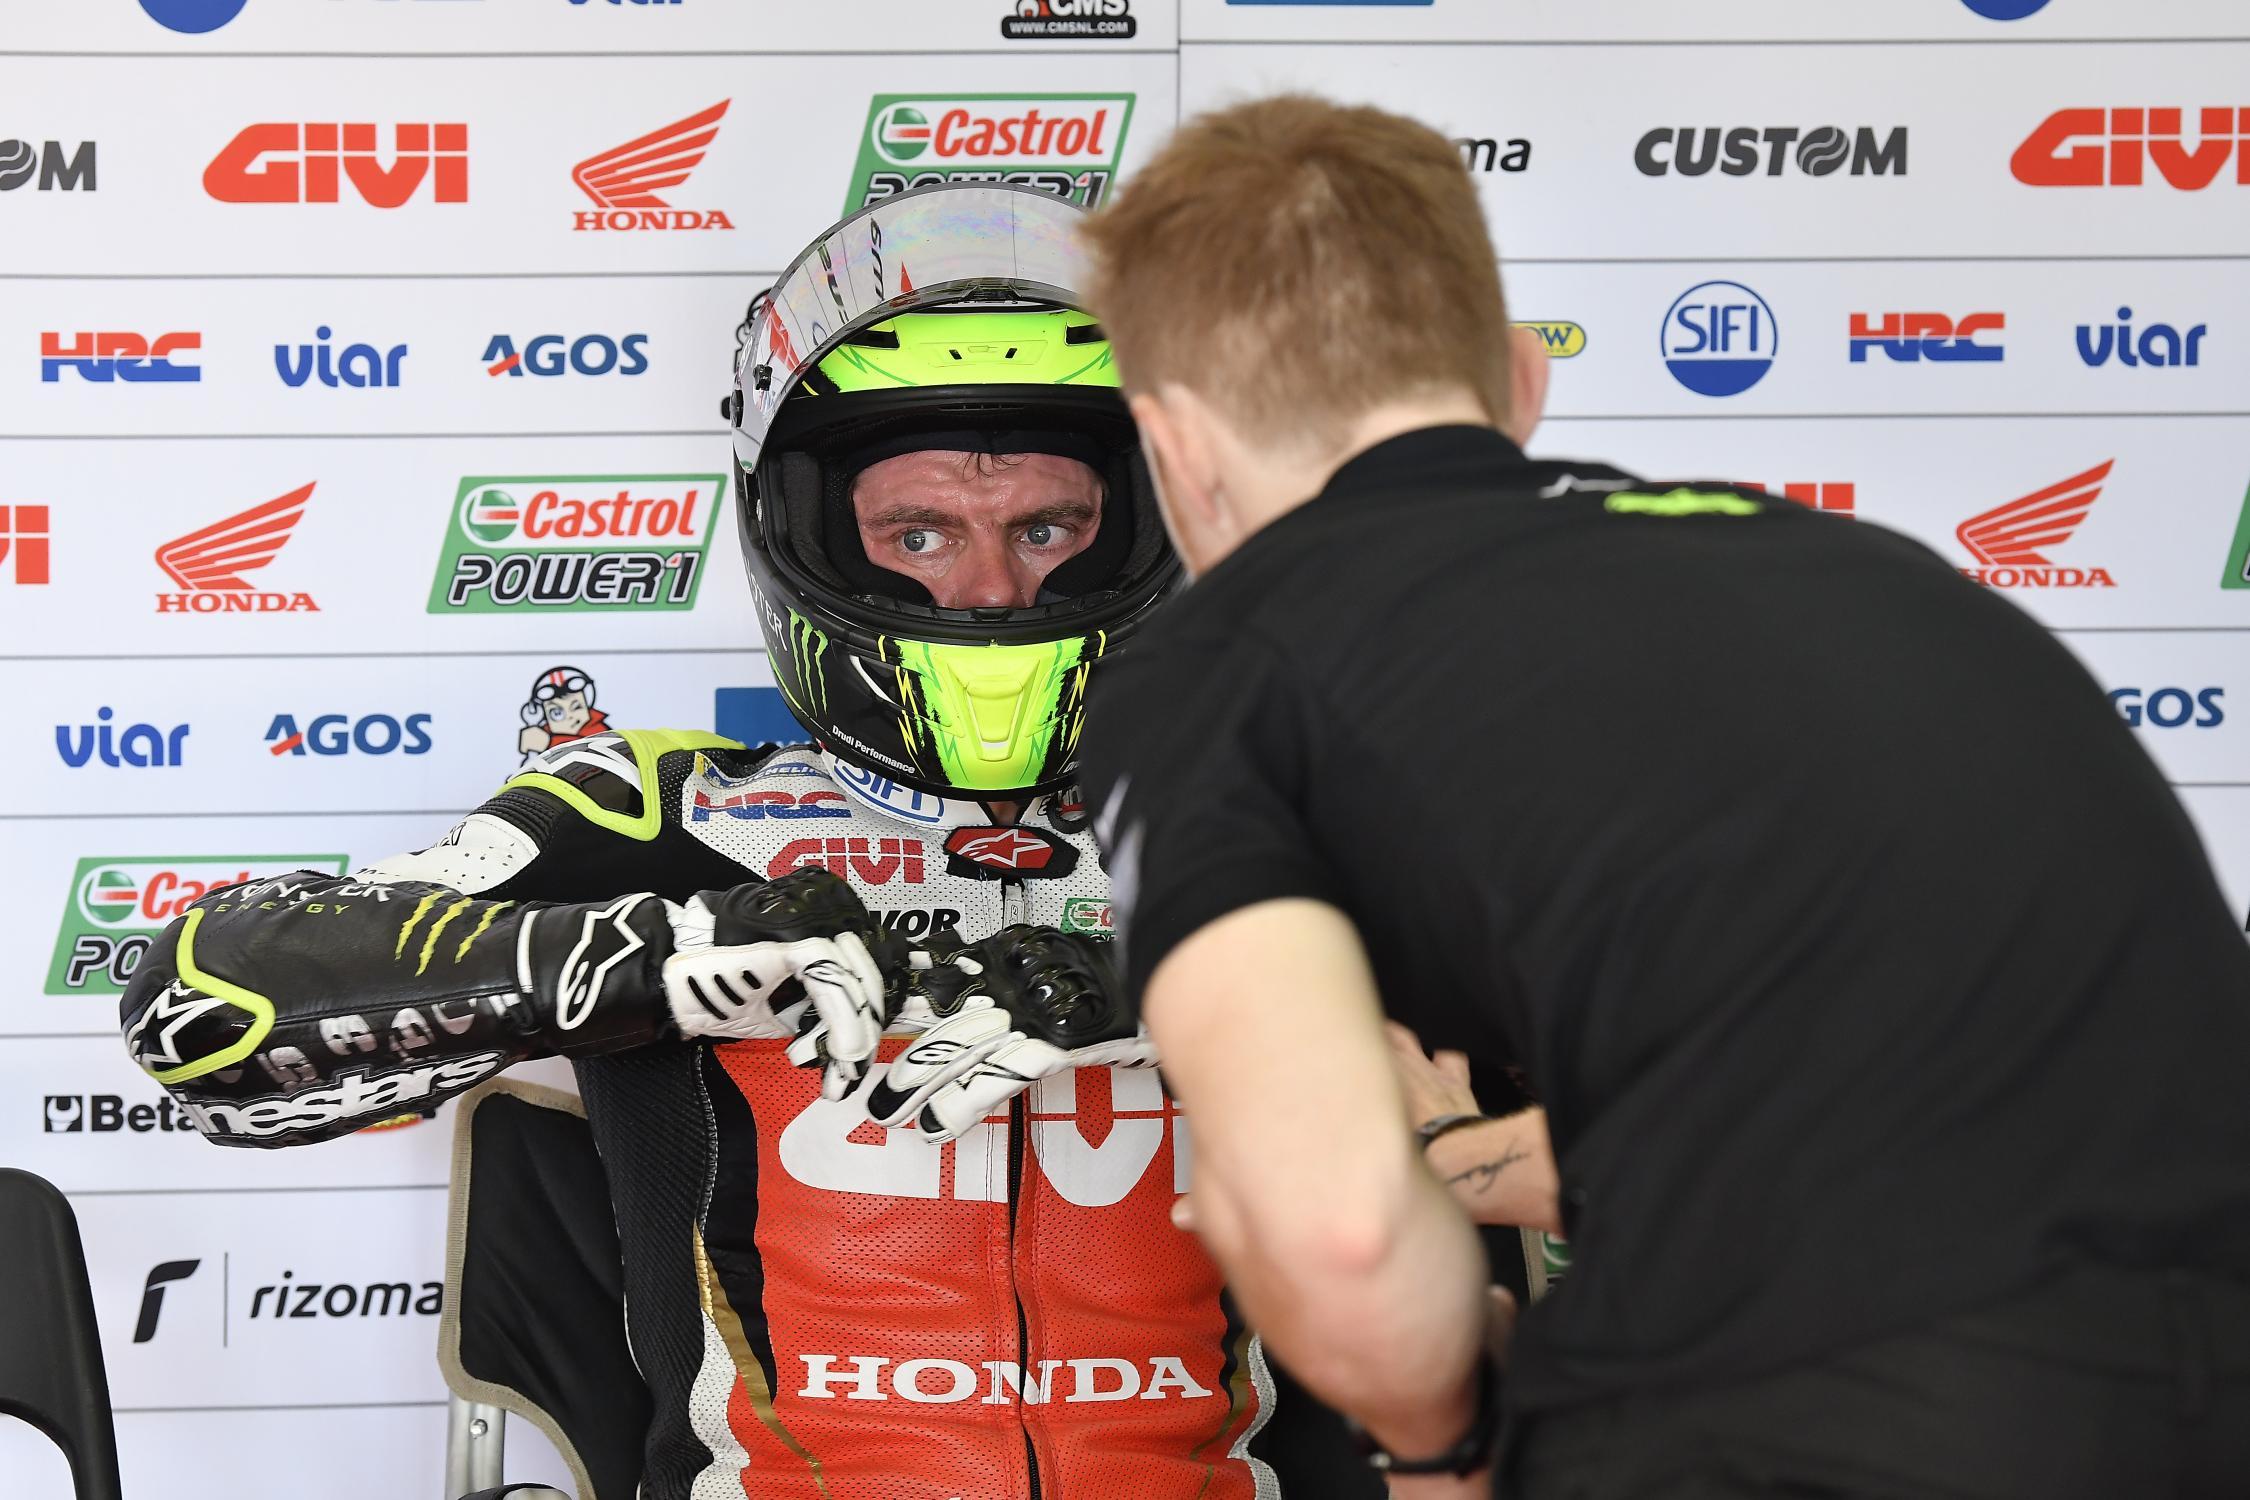 MOTO GP TESTS 2019 - Page 2 Cal-crutchlow-sepang-test-motogp-2019-box